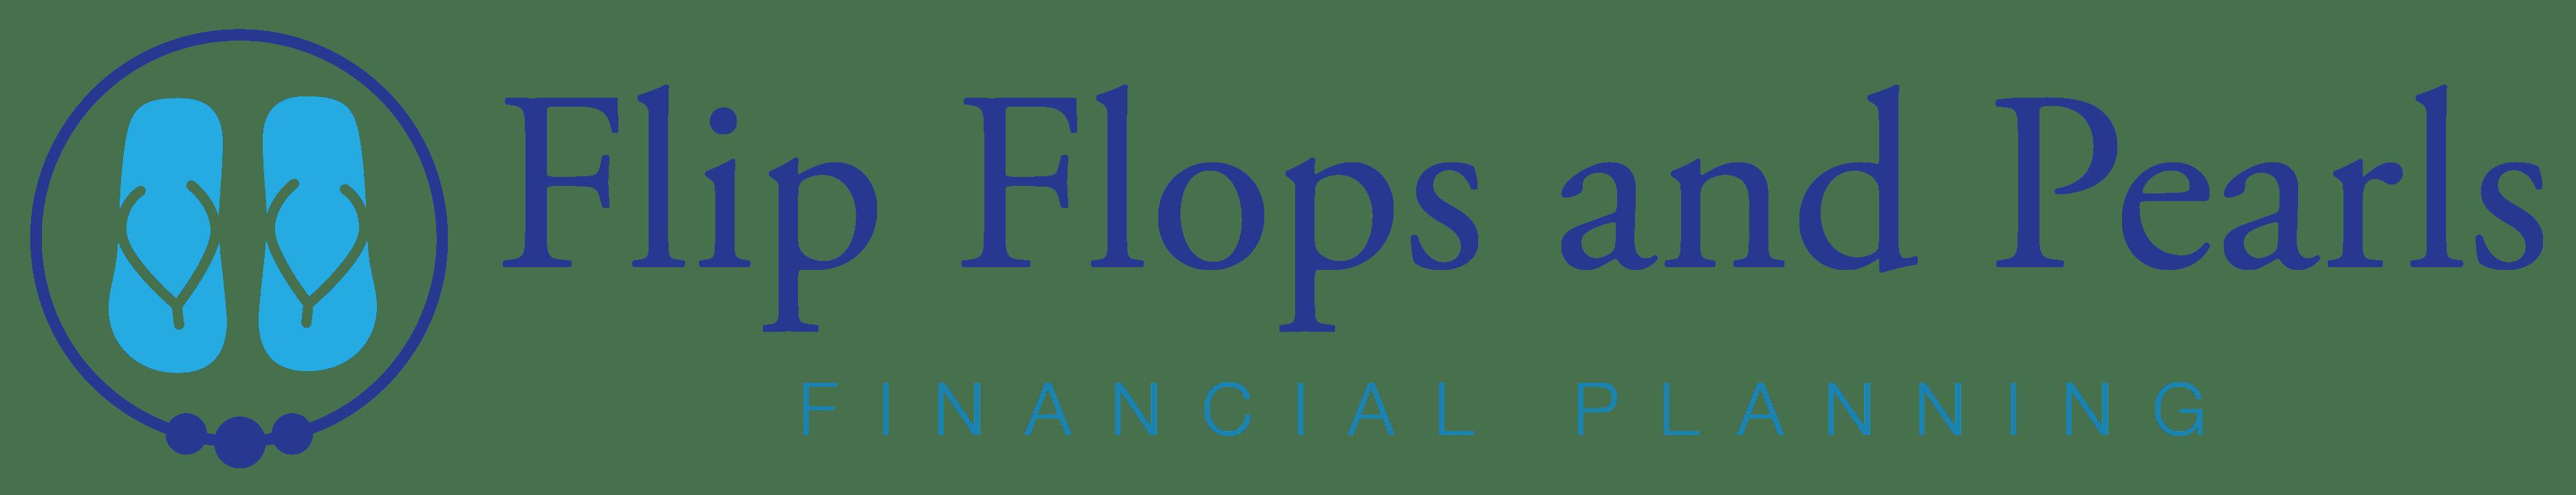 Flip Flops and Pearls Full horizontal logo